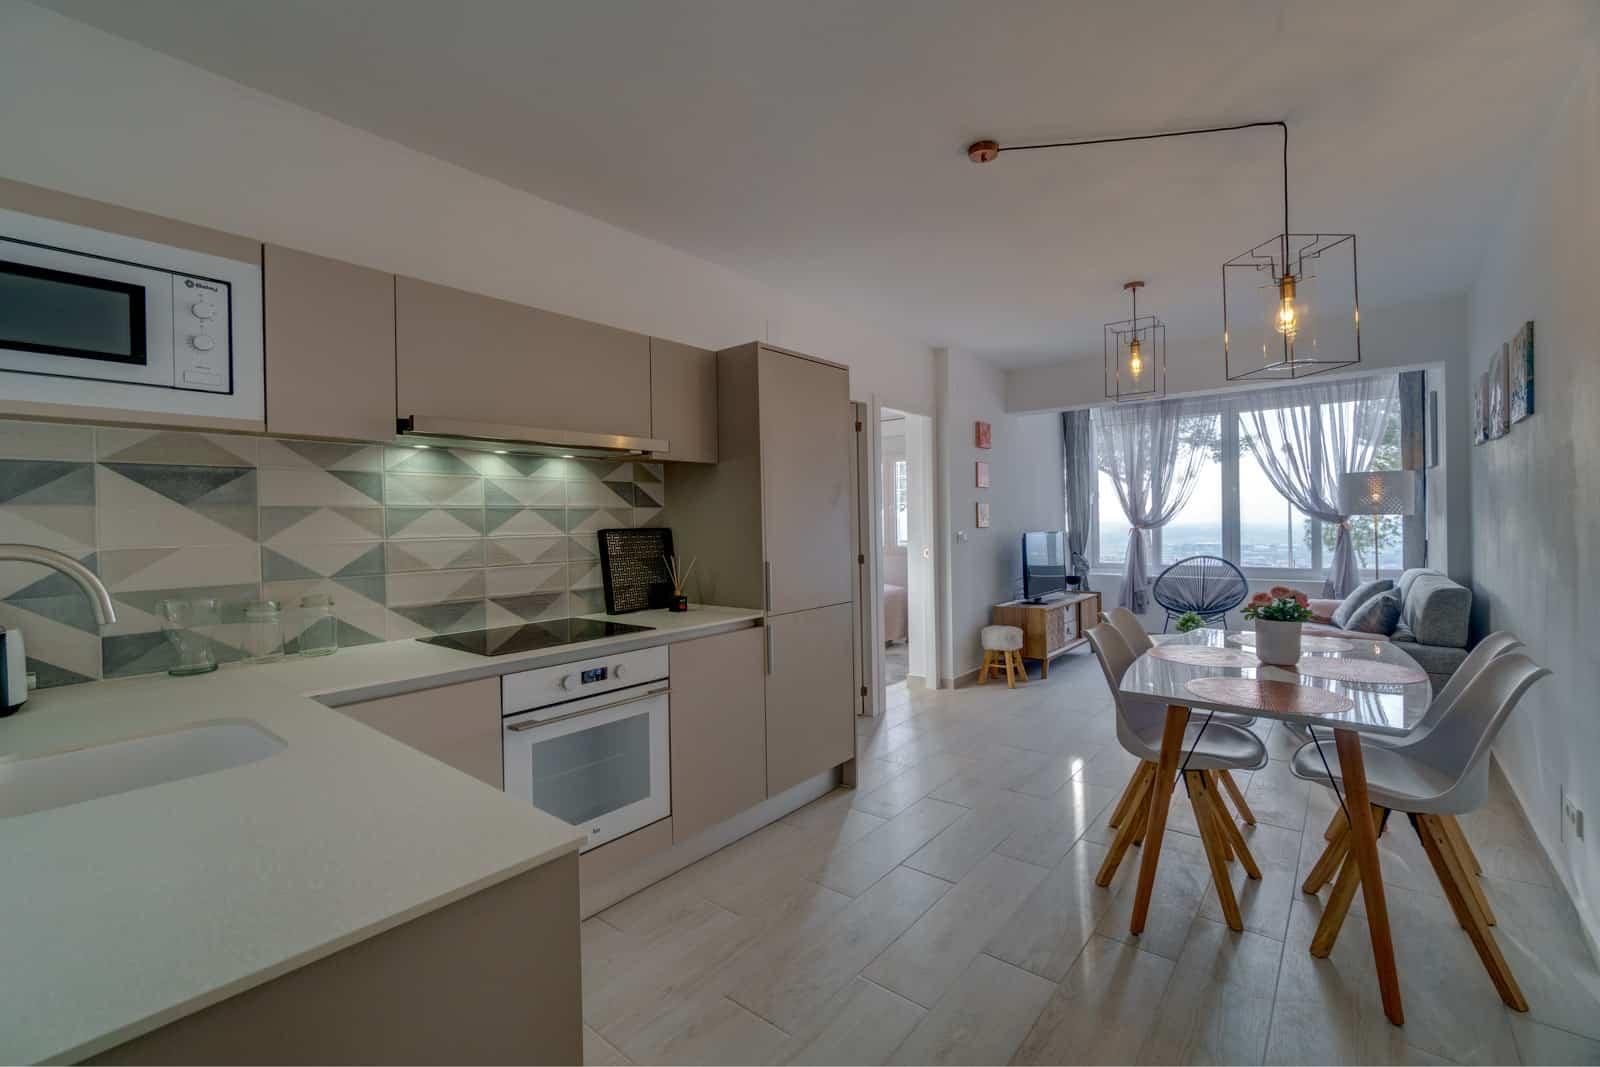 real estate interior photo of open plan kitchen